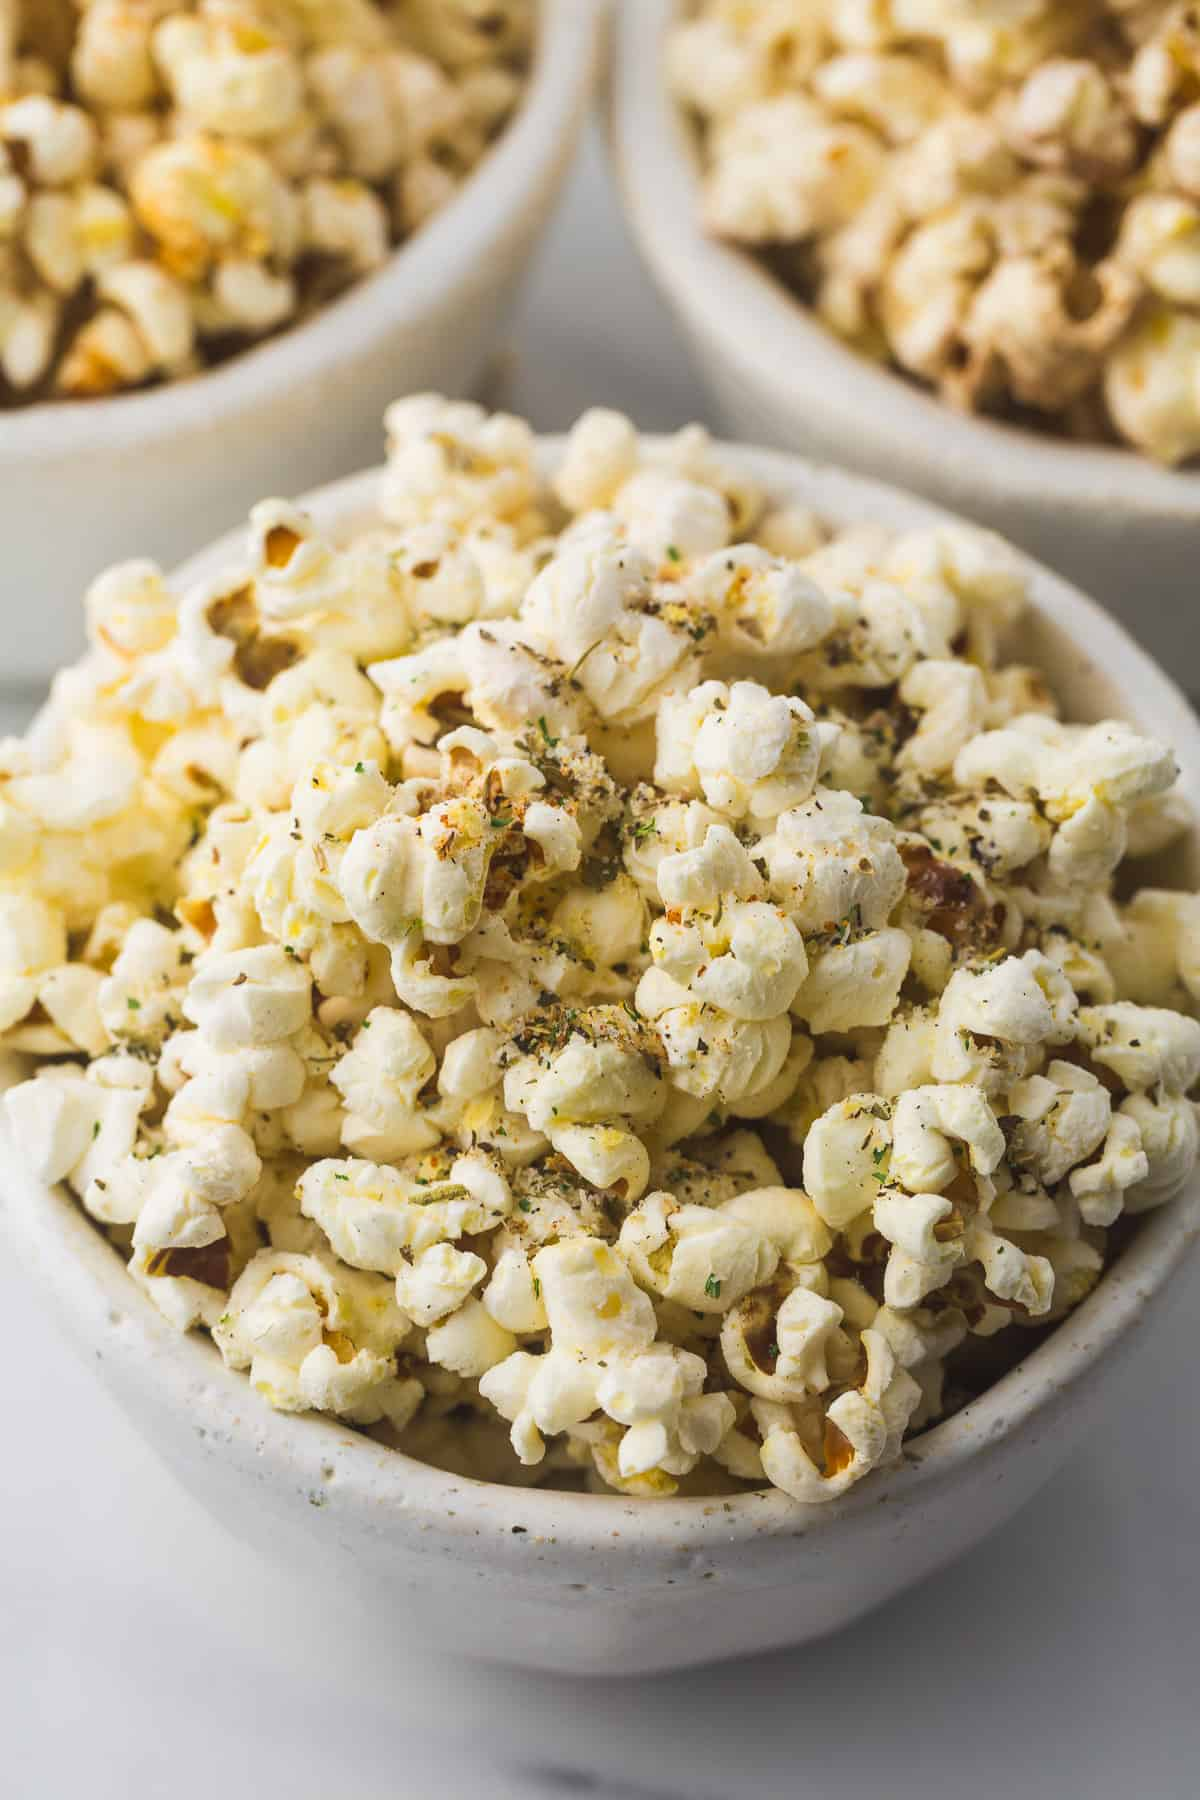 Flavored parmesan garlic popcorn